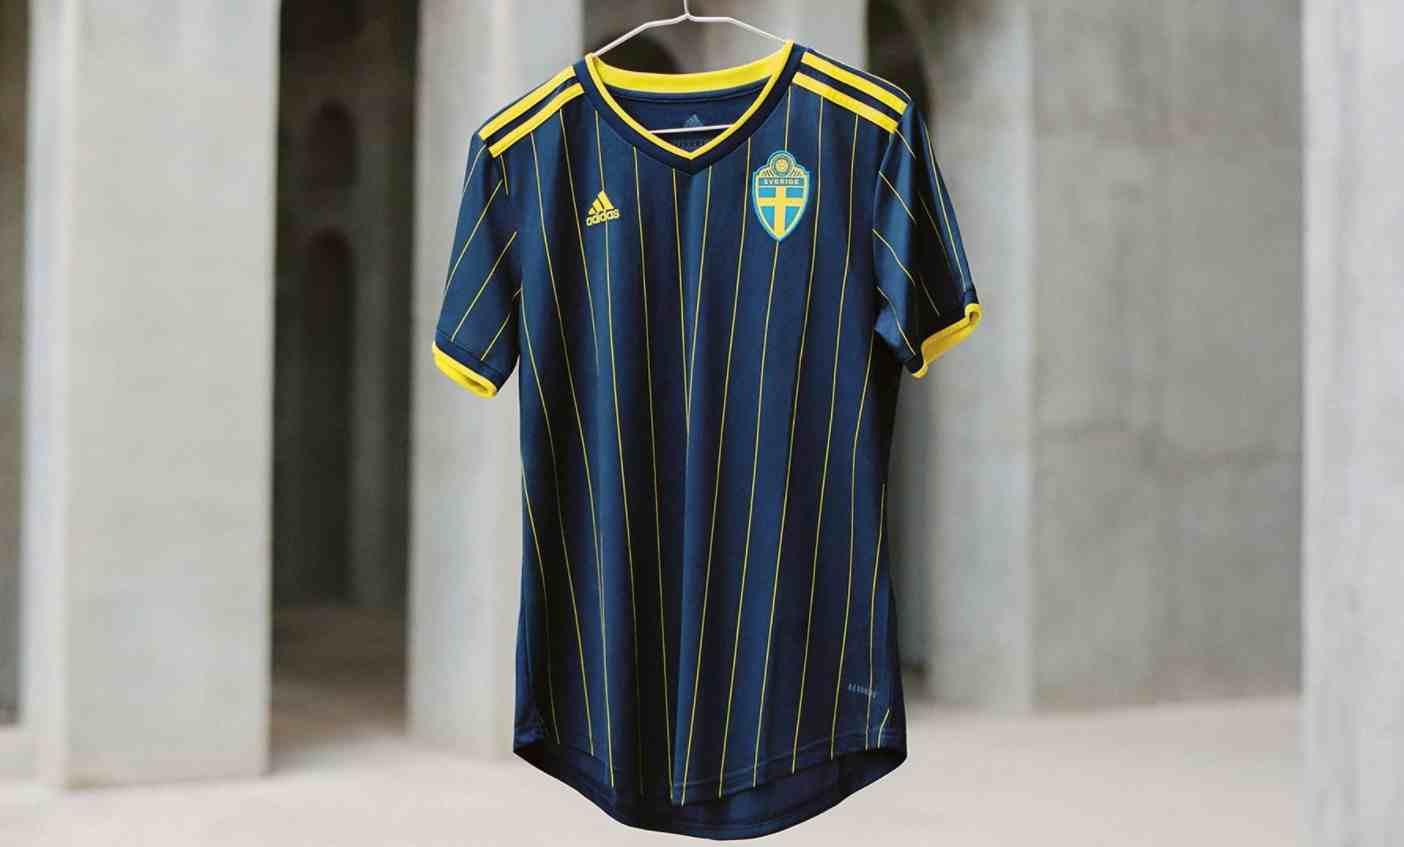 La espectacular camiseta alternativa adidas de Suecia